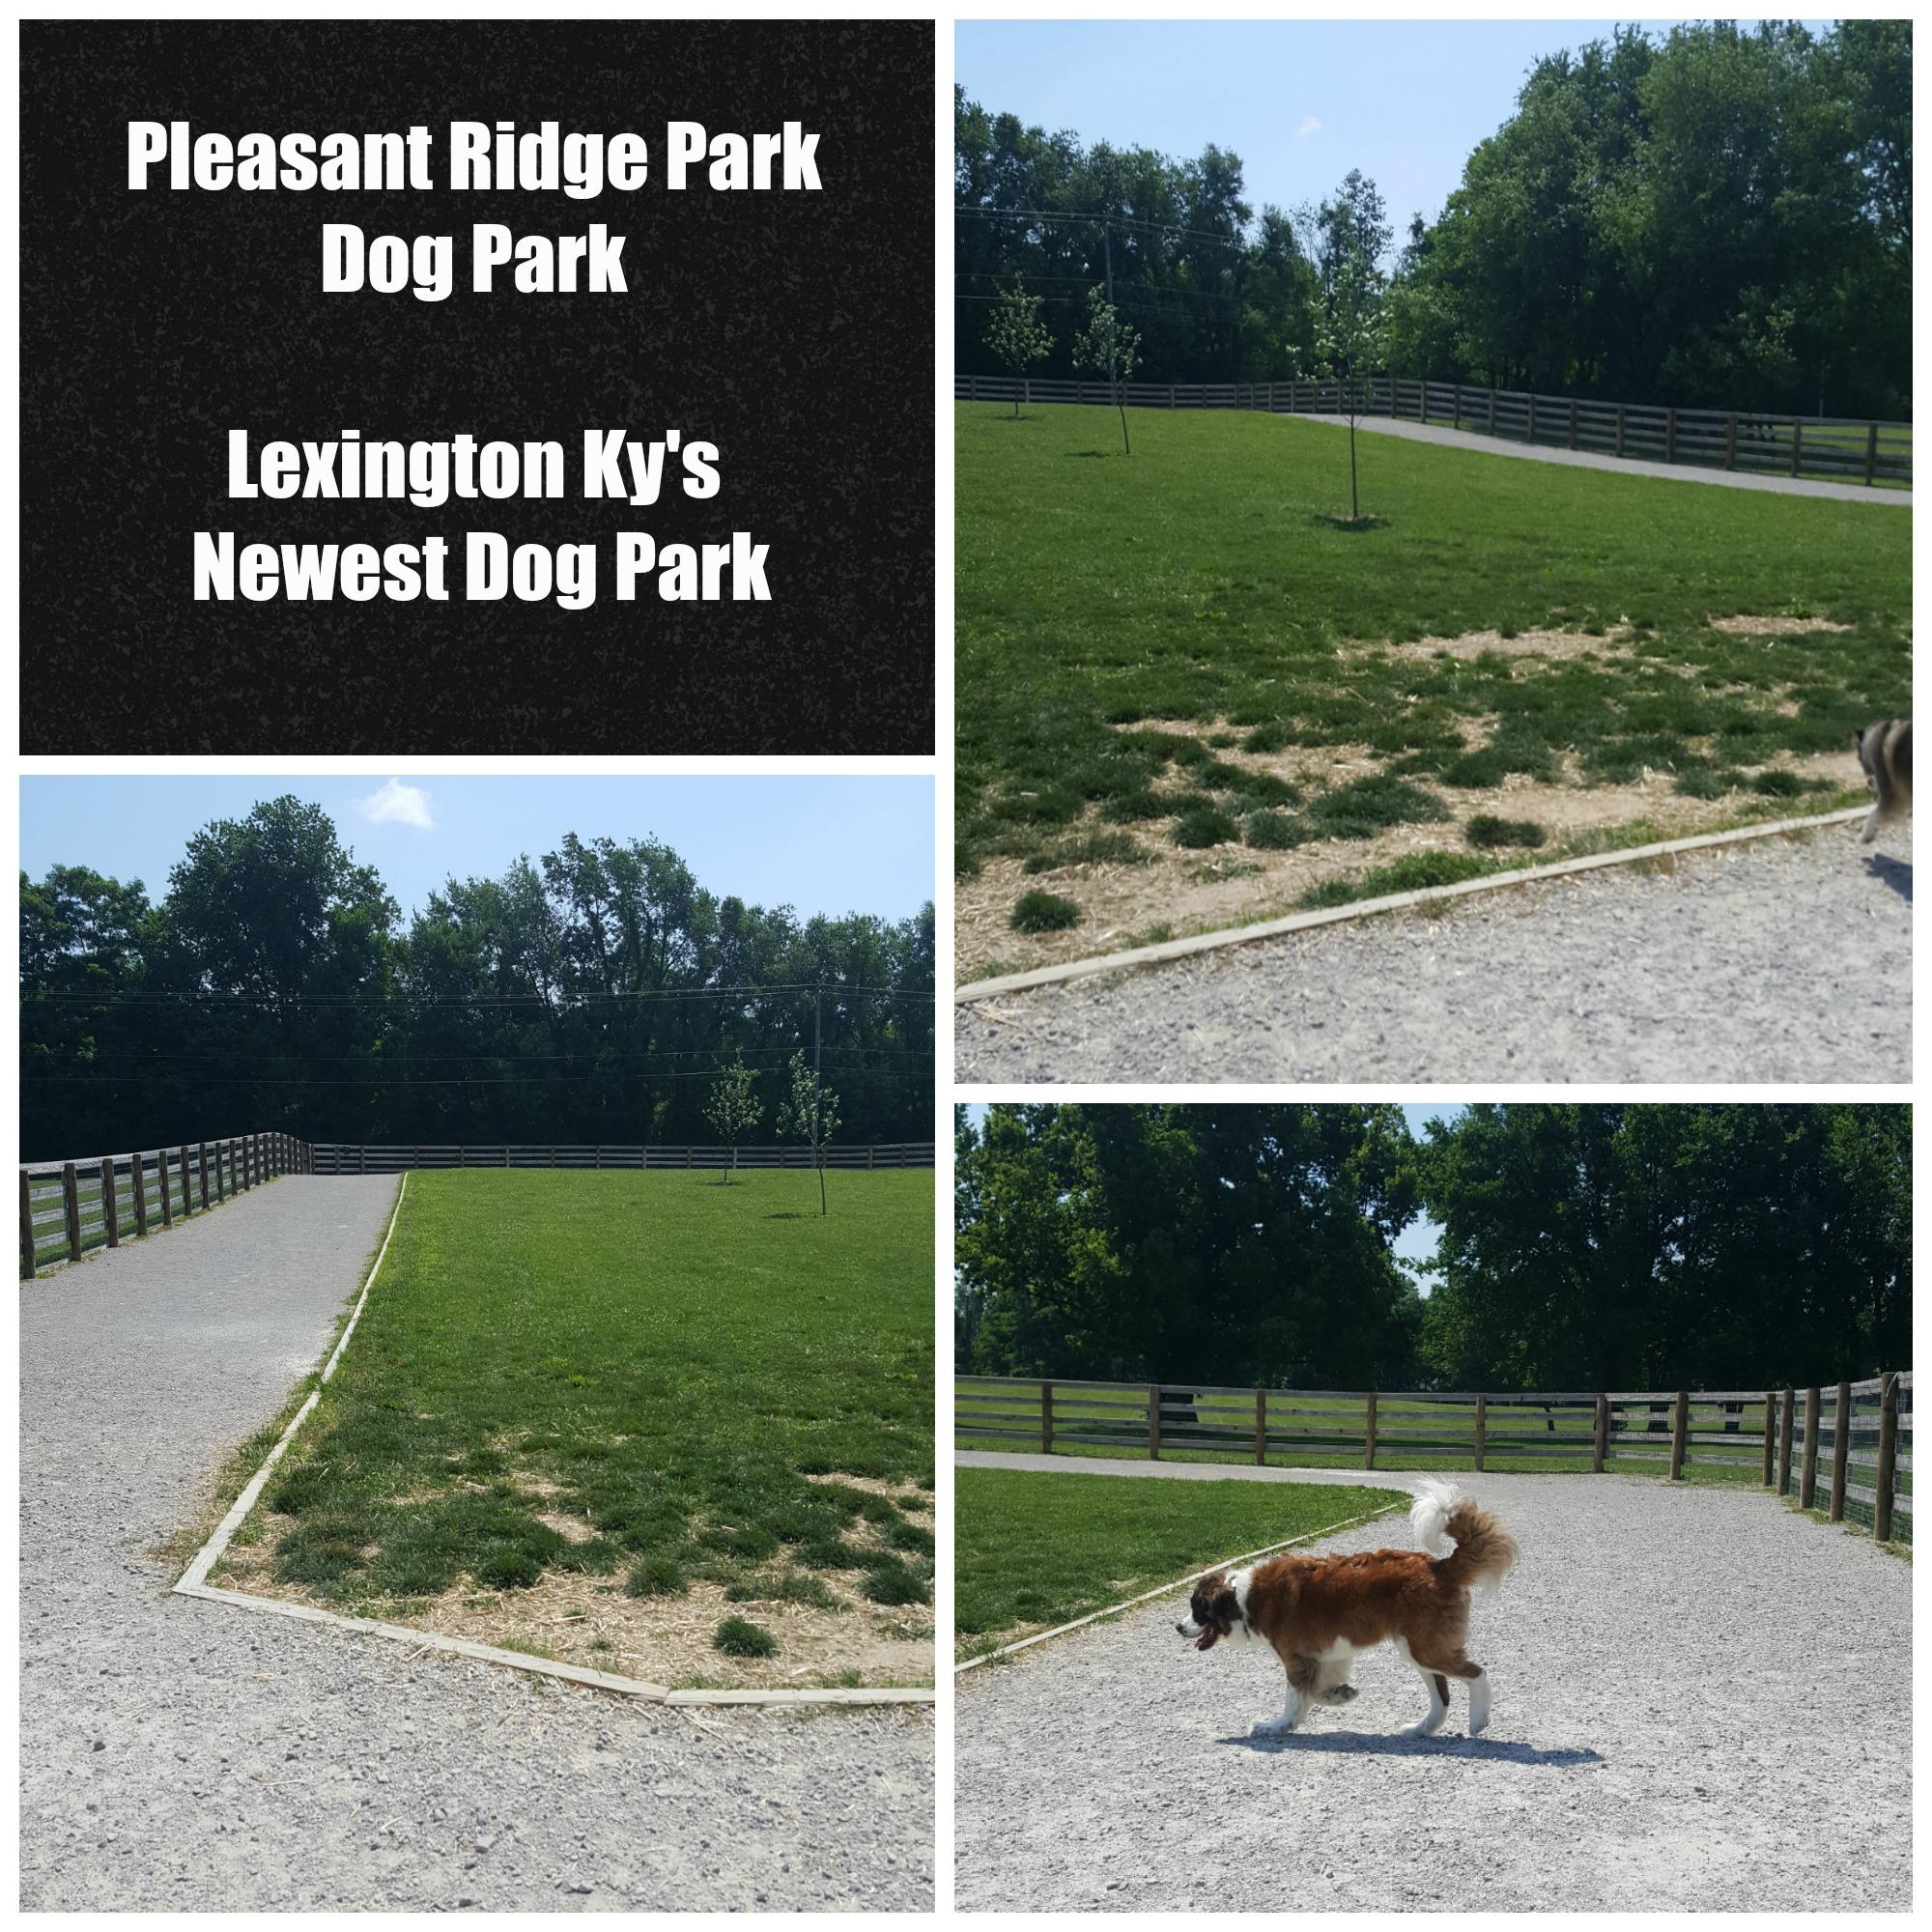 Pleasure ridge park ky